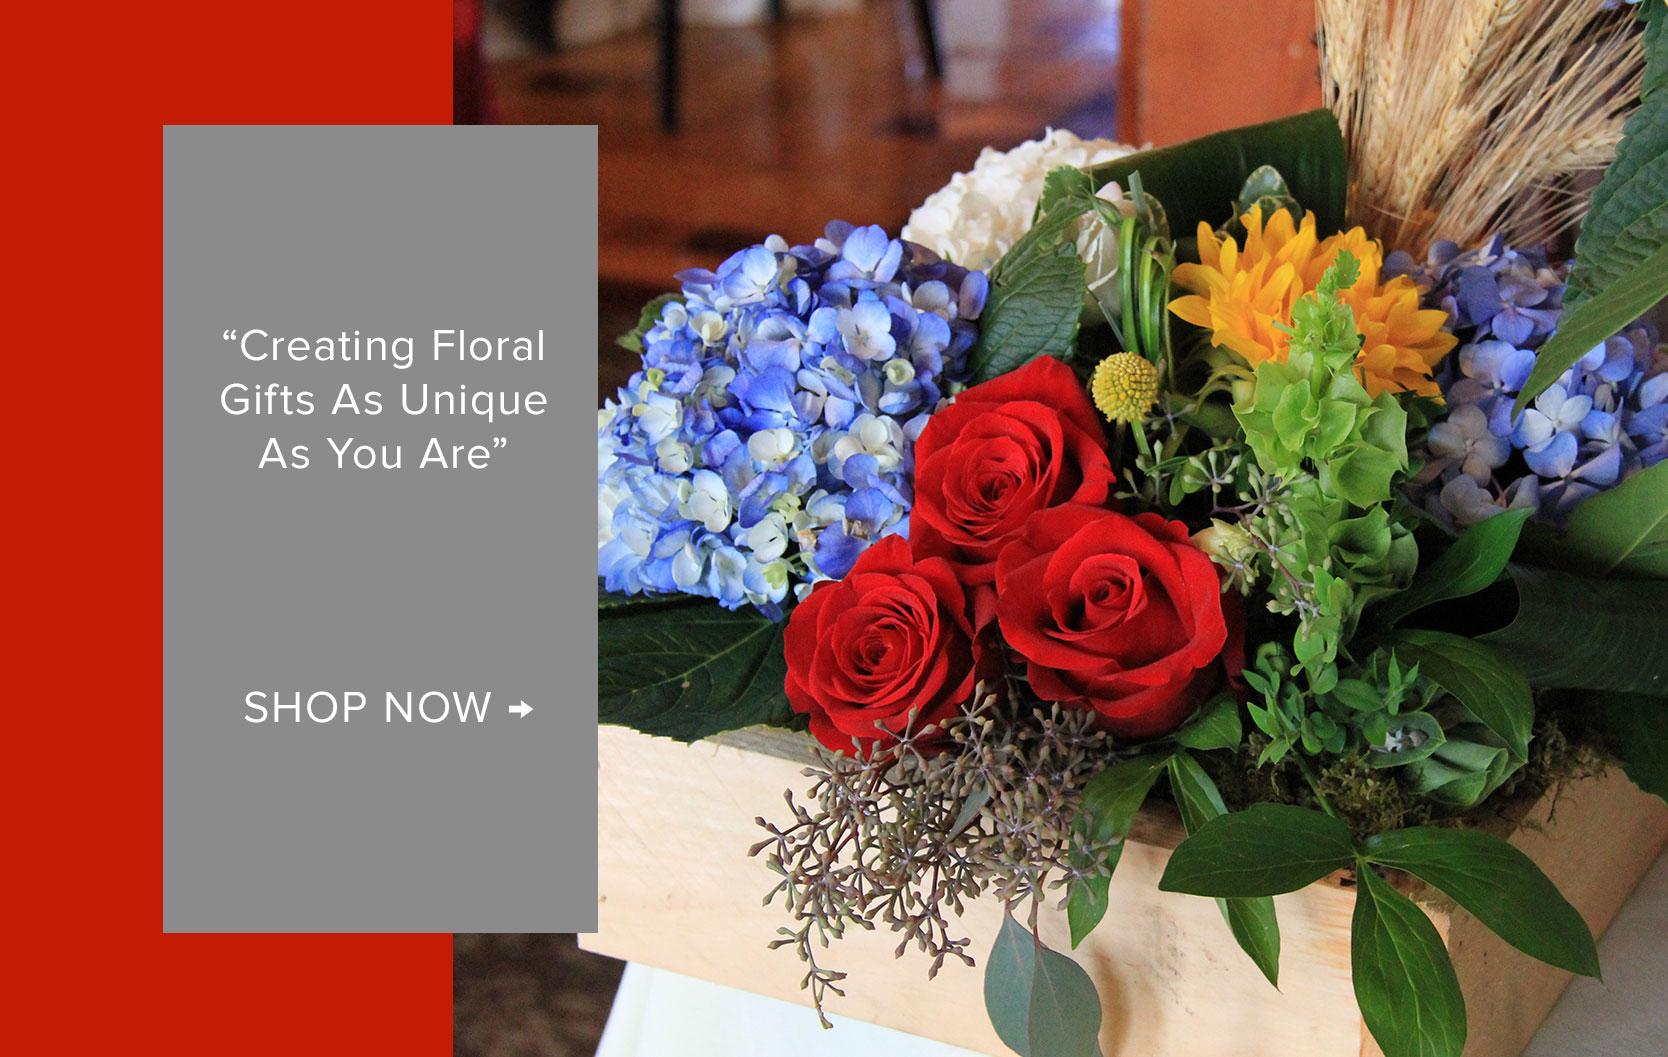 Floral images florist graphic Westford Florist | Flower Delivery by Floral Arts graphic